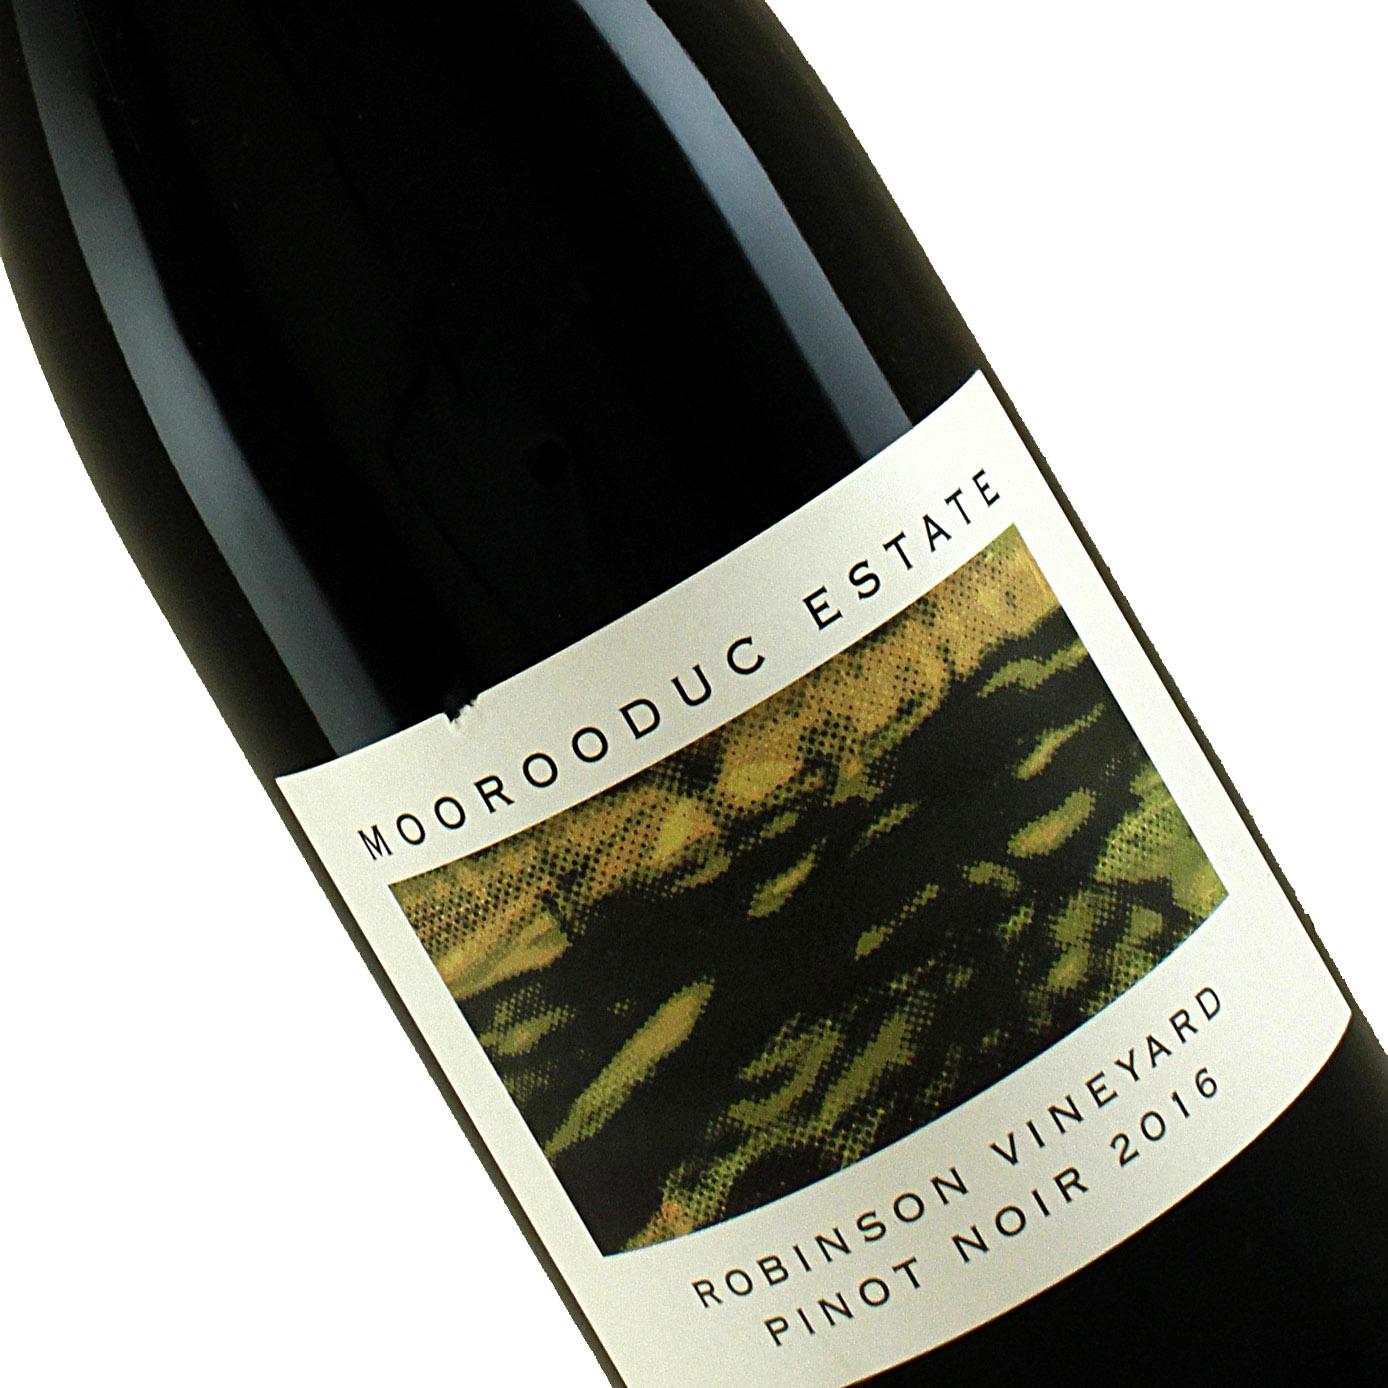 Moorooduc Estate 2016 Robinson Vineyard Pinot Noir, Australia